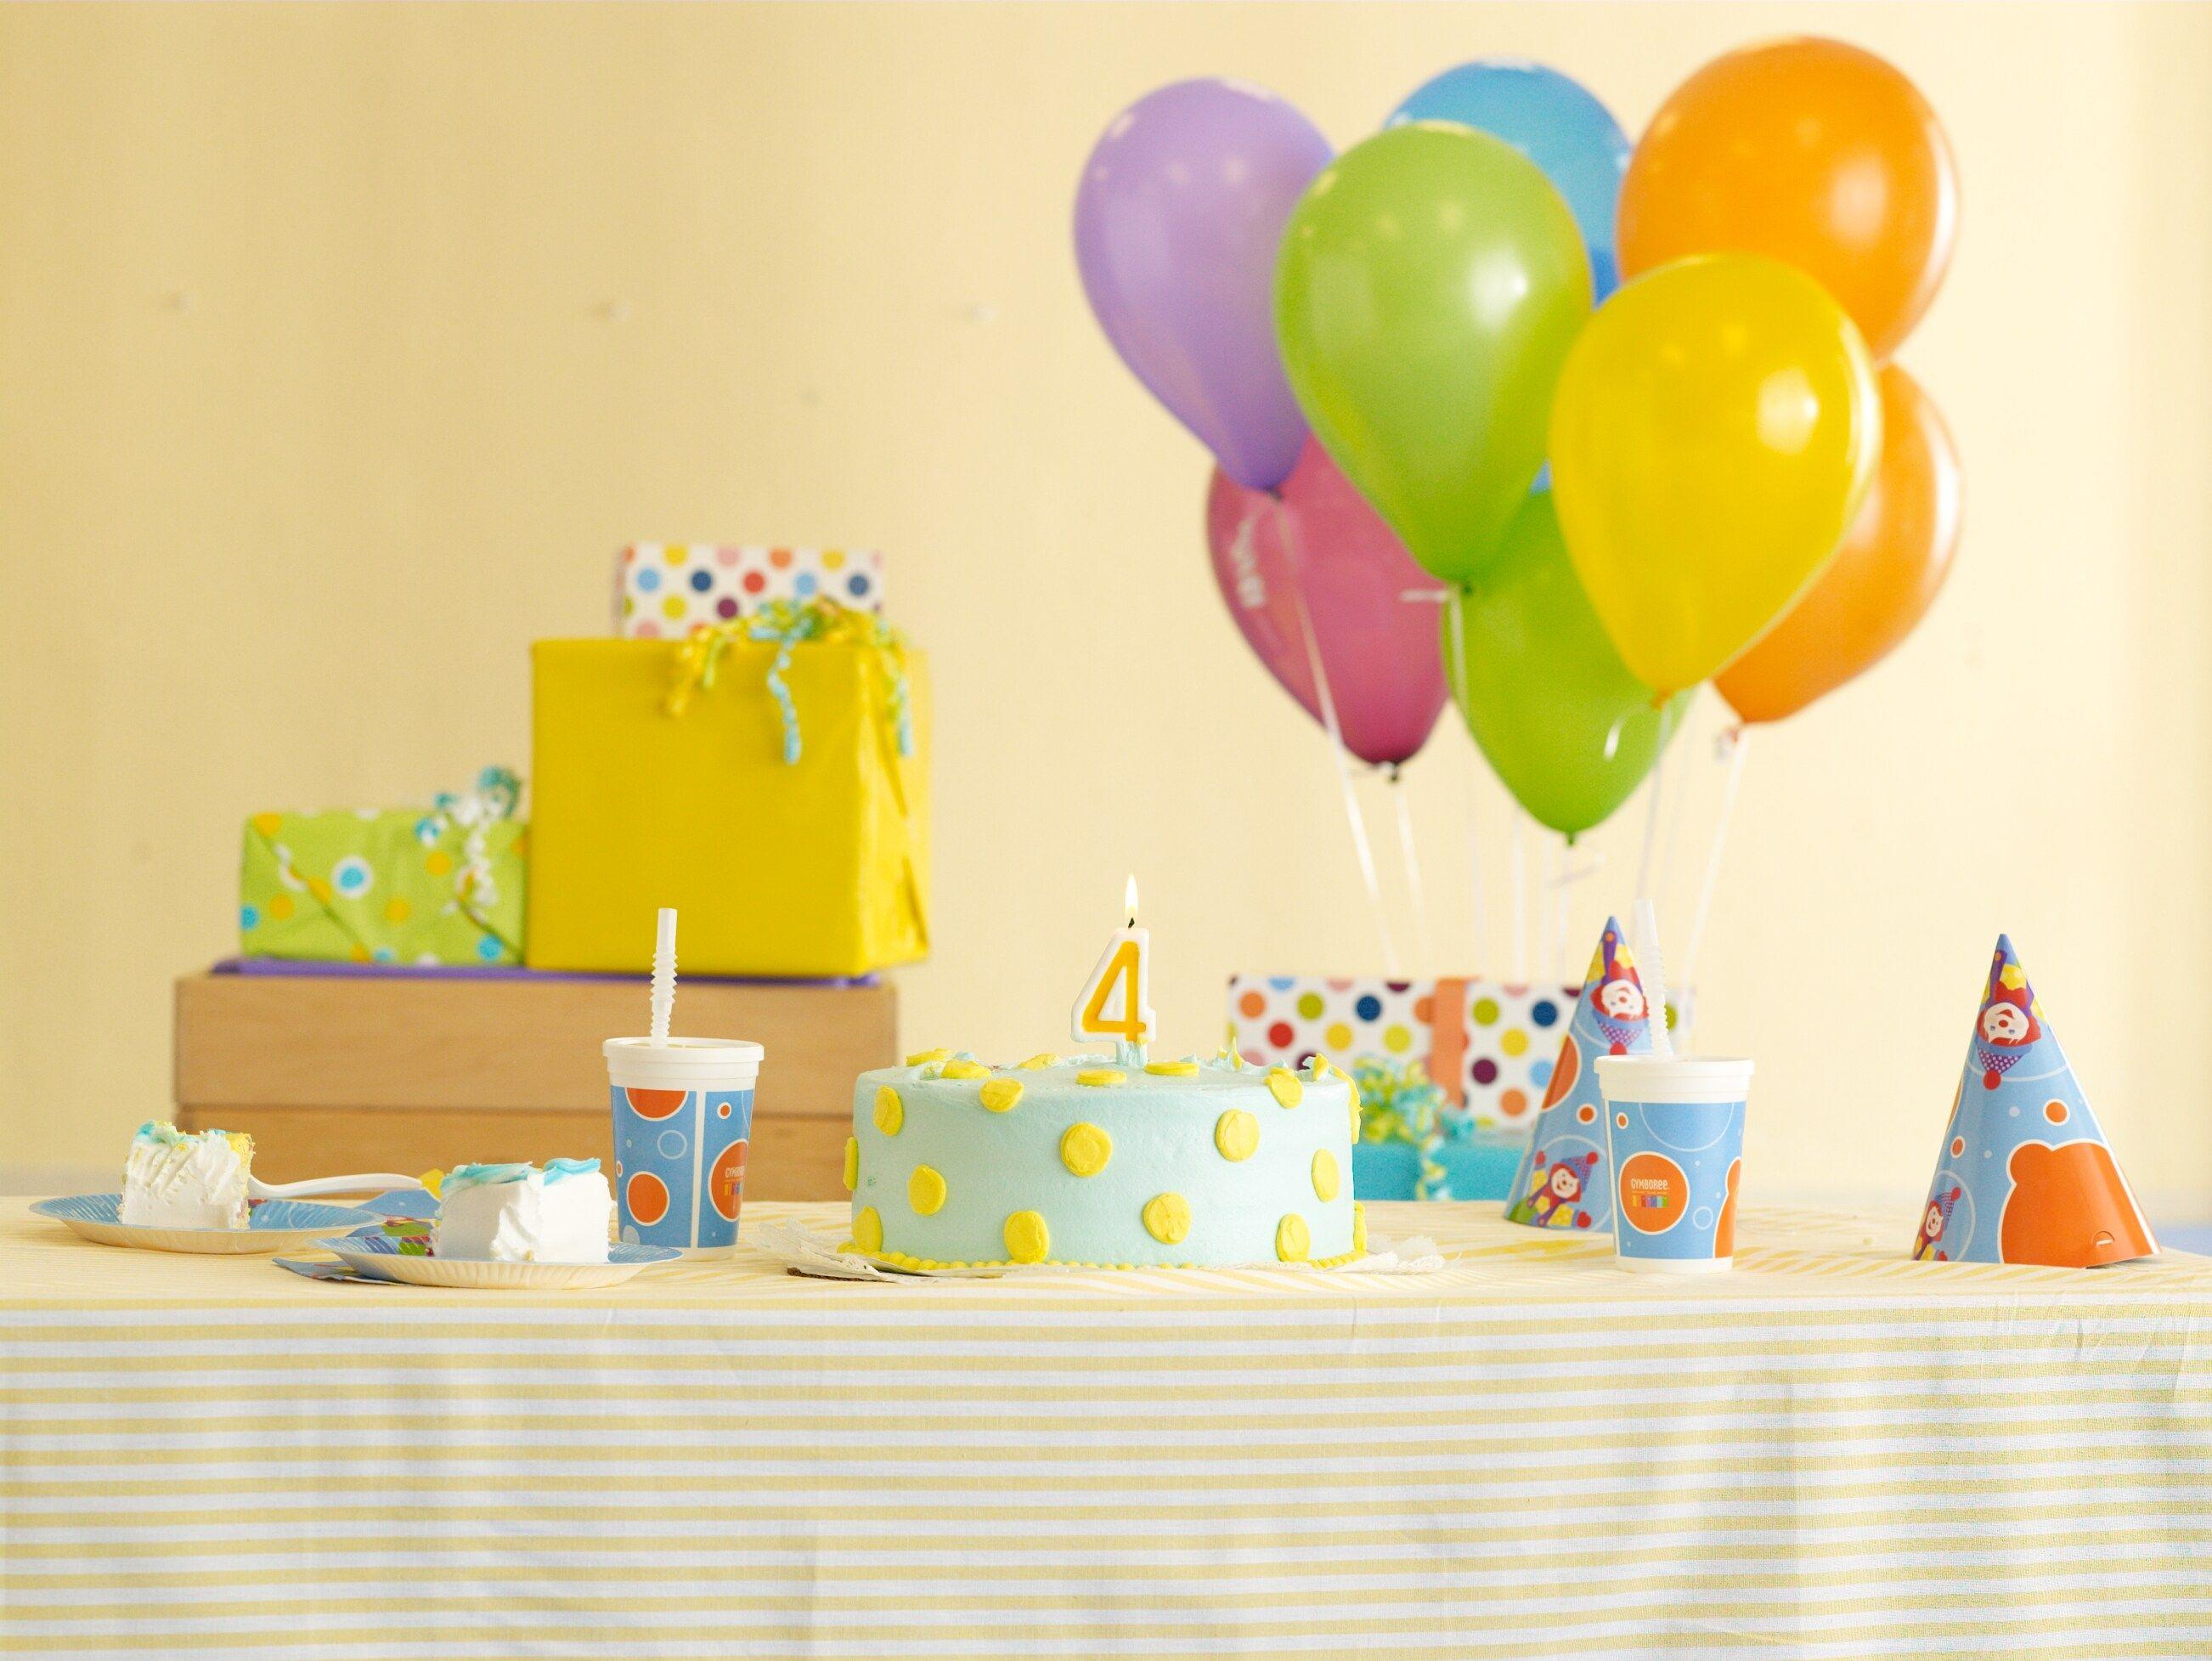 Gymboree Play Music Of Atlanta Atlanta Birthday Parties - Children's birthday party atlanta